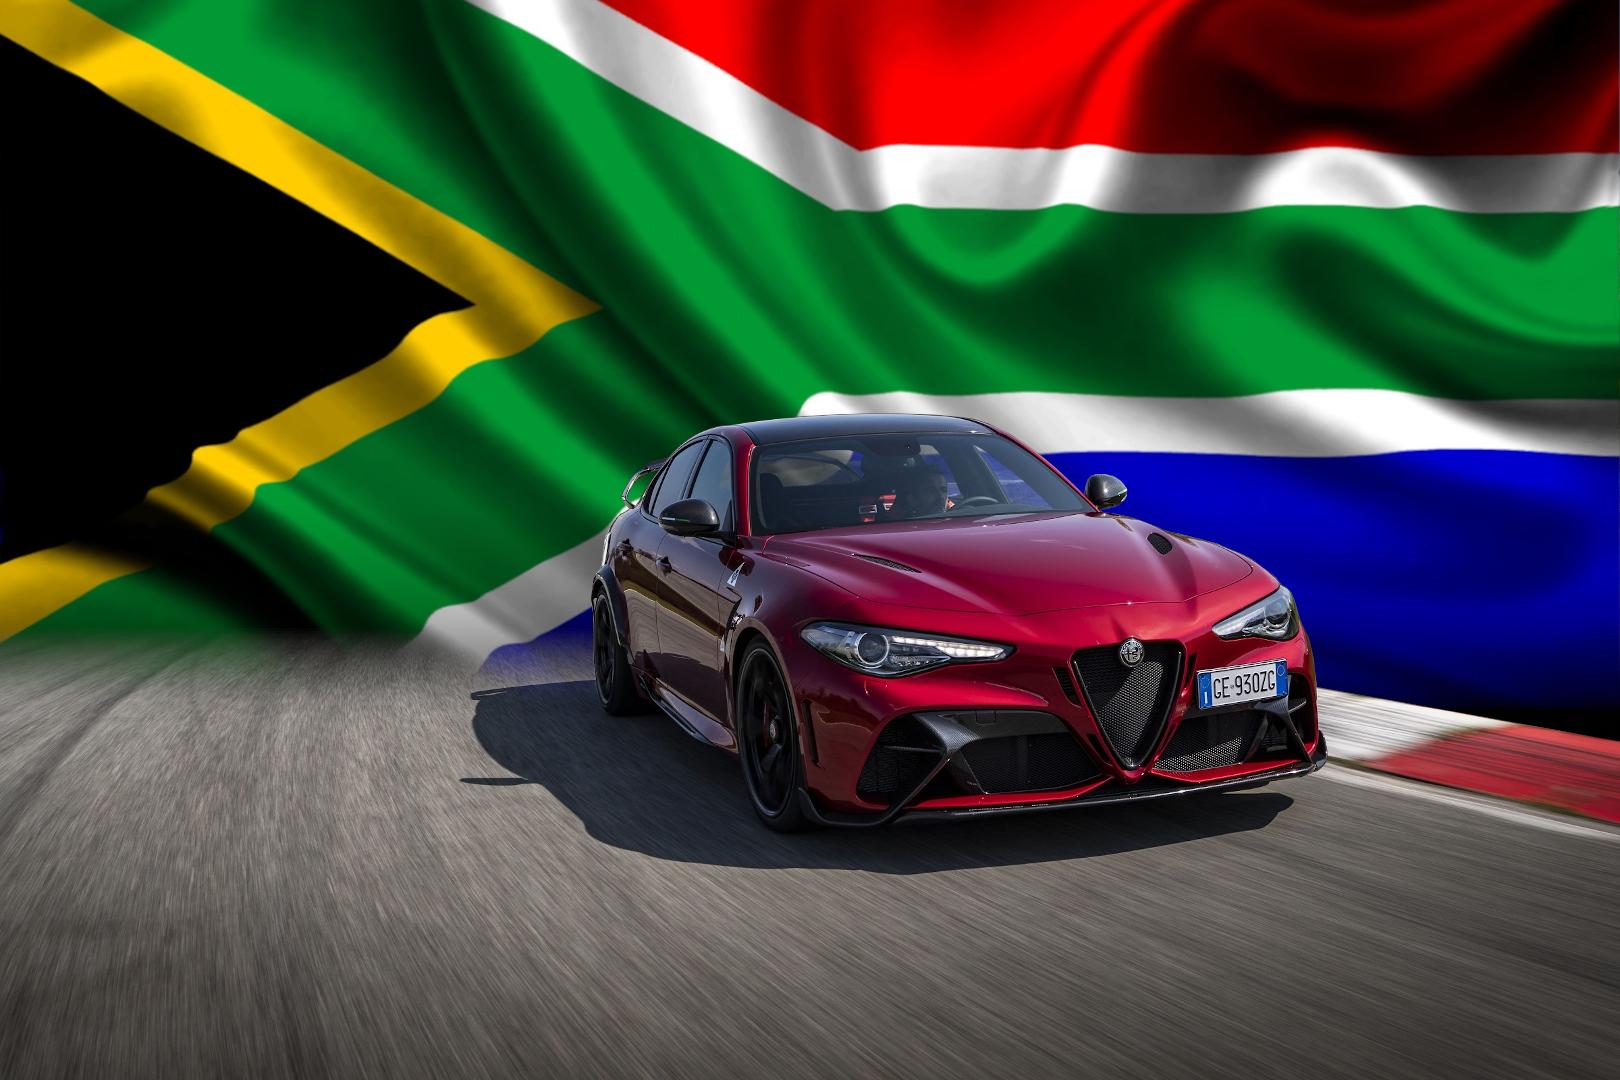 Alfa Romeo, Giulia GTA, Giulia GTAm, South Africa, Price, Cost, Torquing Cars